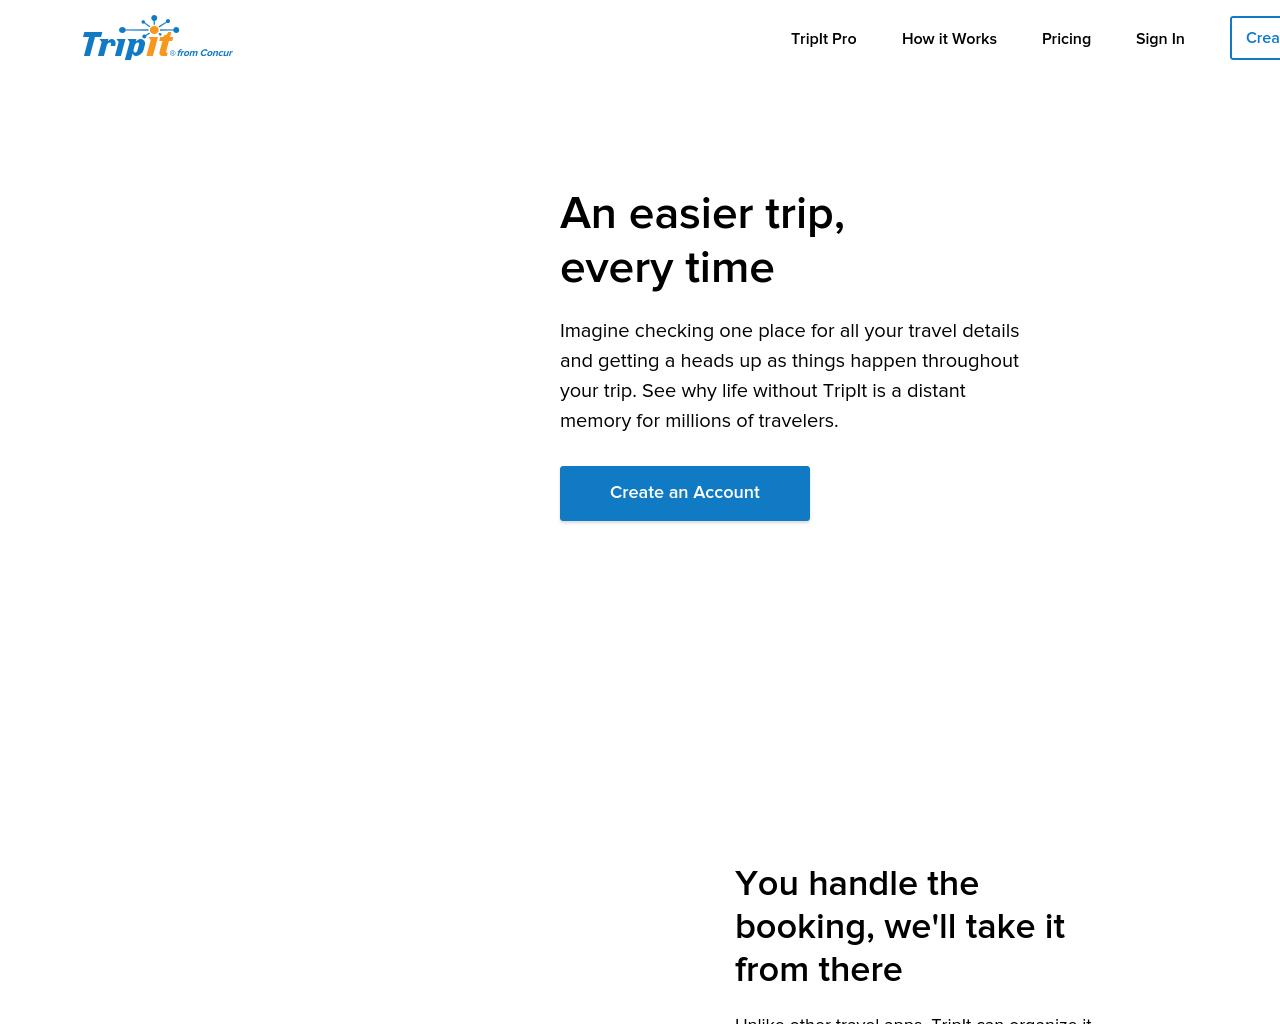 Tripit Advertising Mediakits, Reviews, Pricing, Traffic